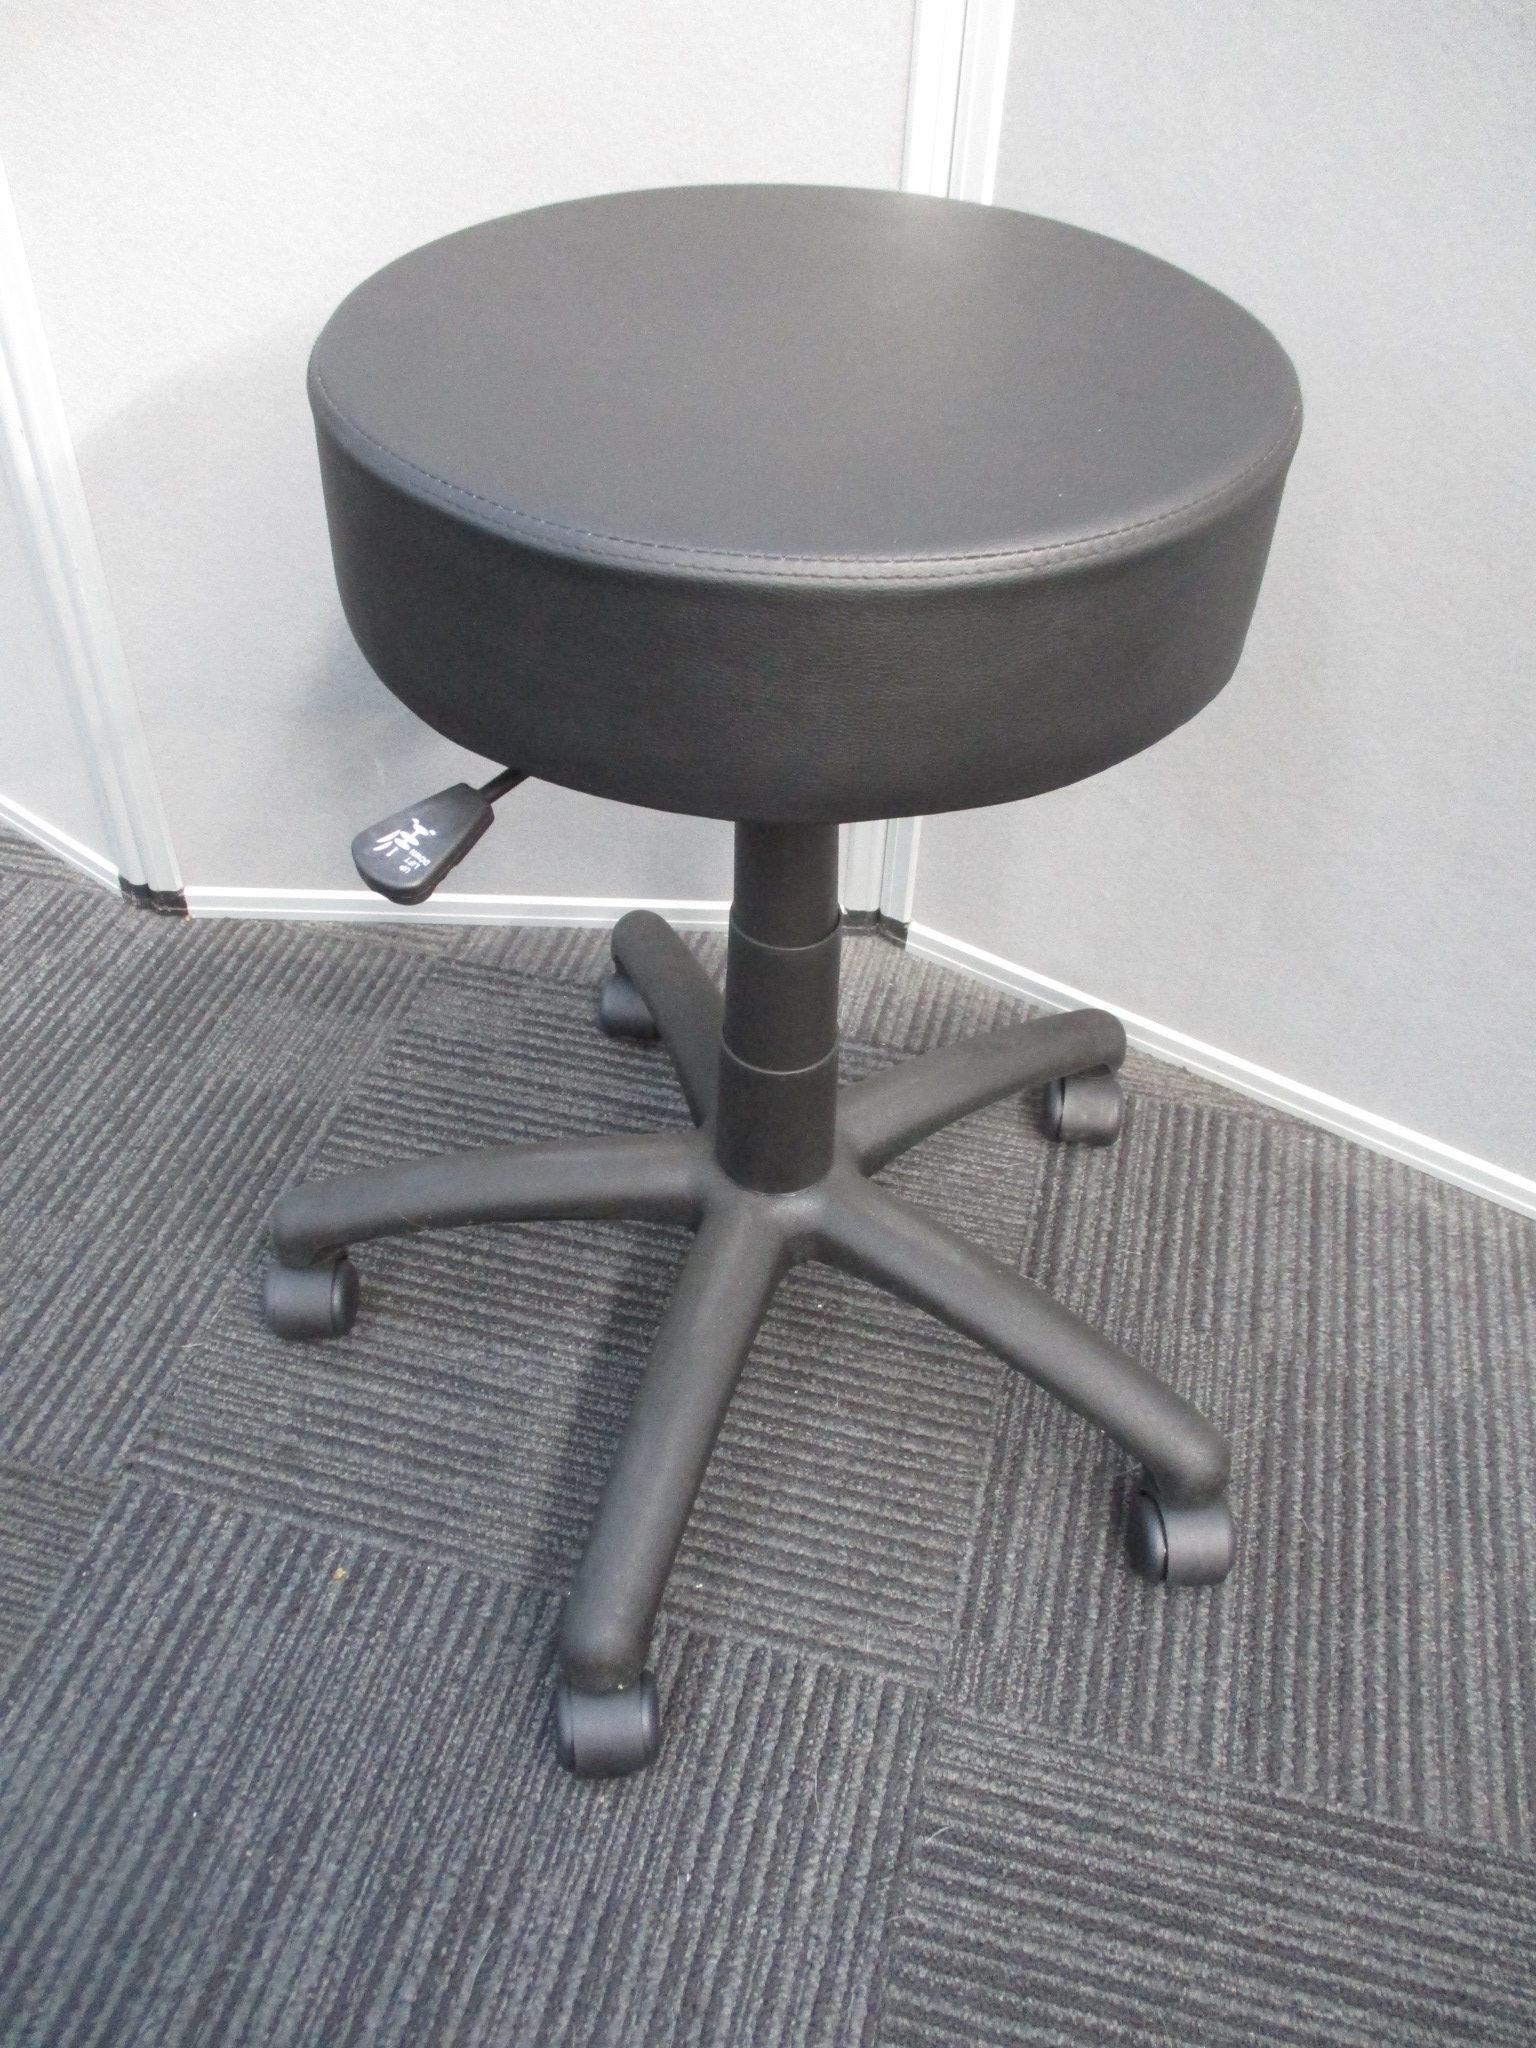 New Data Stools Desk Height $120